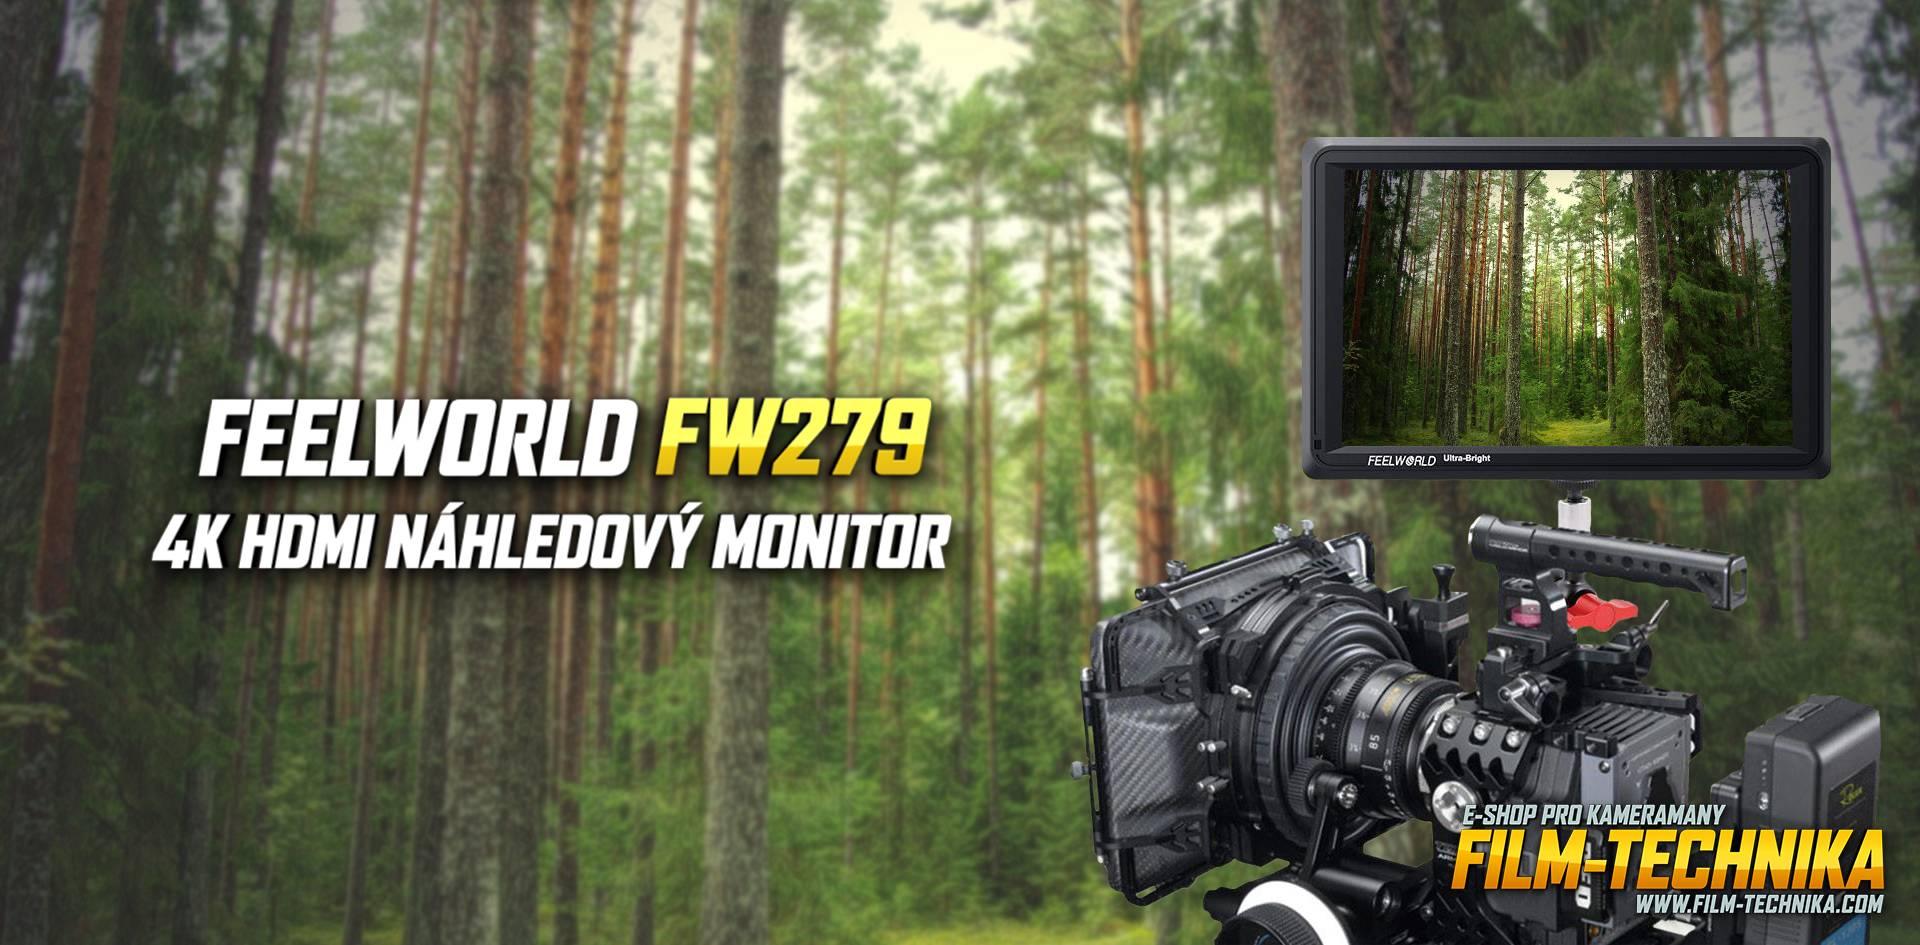 film-technika-feelworld-fw279-4k-hdmi-monitor-uvodní